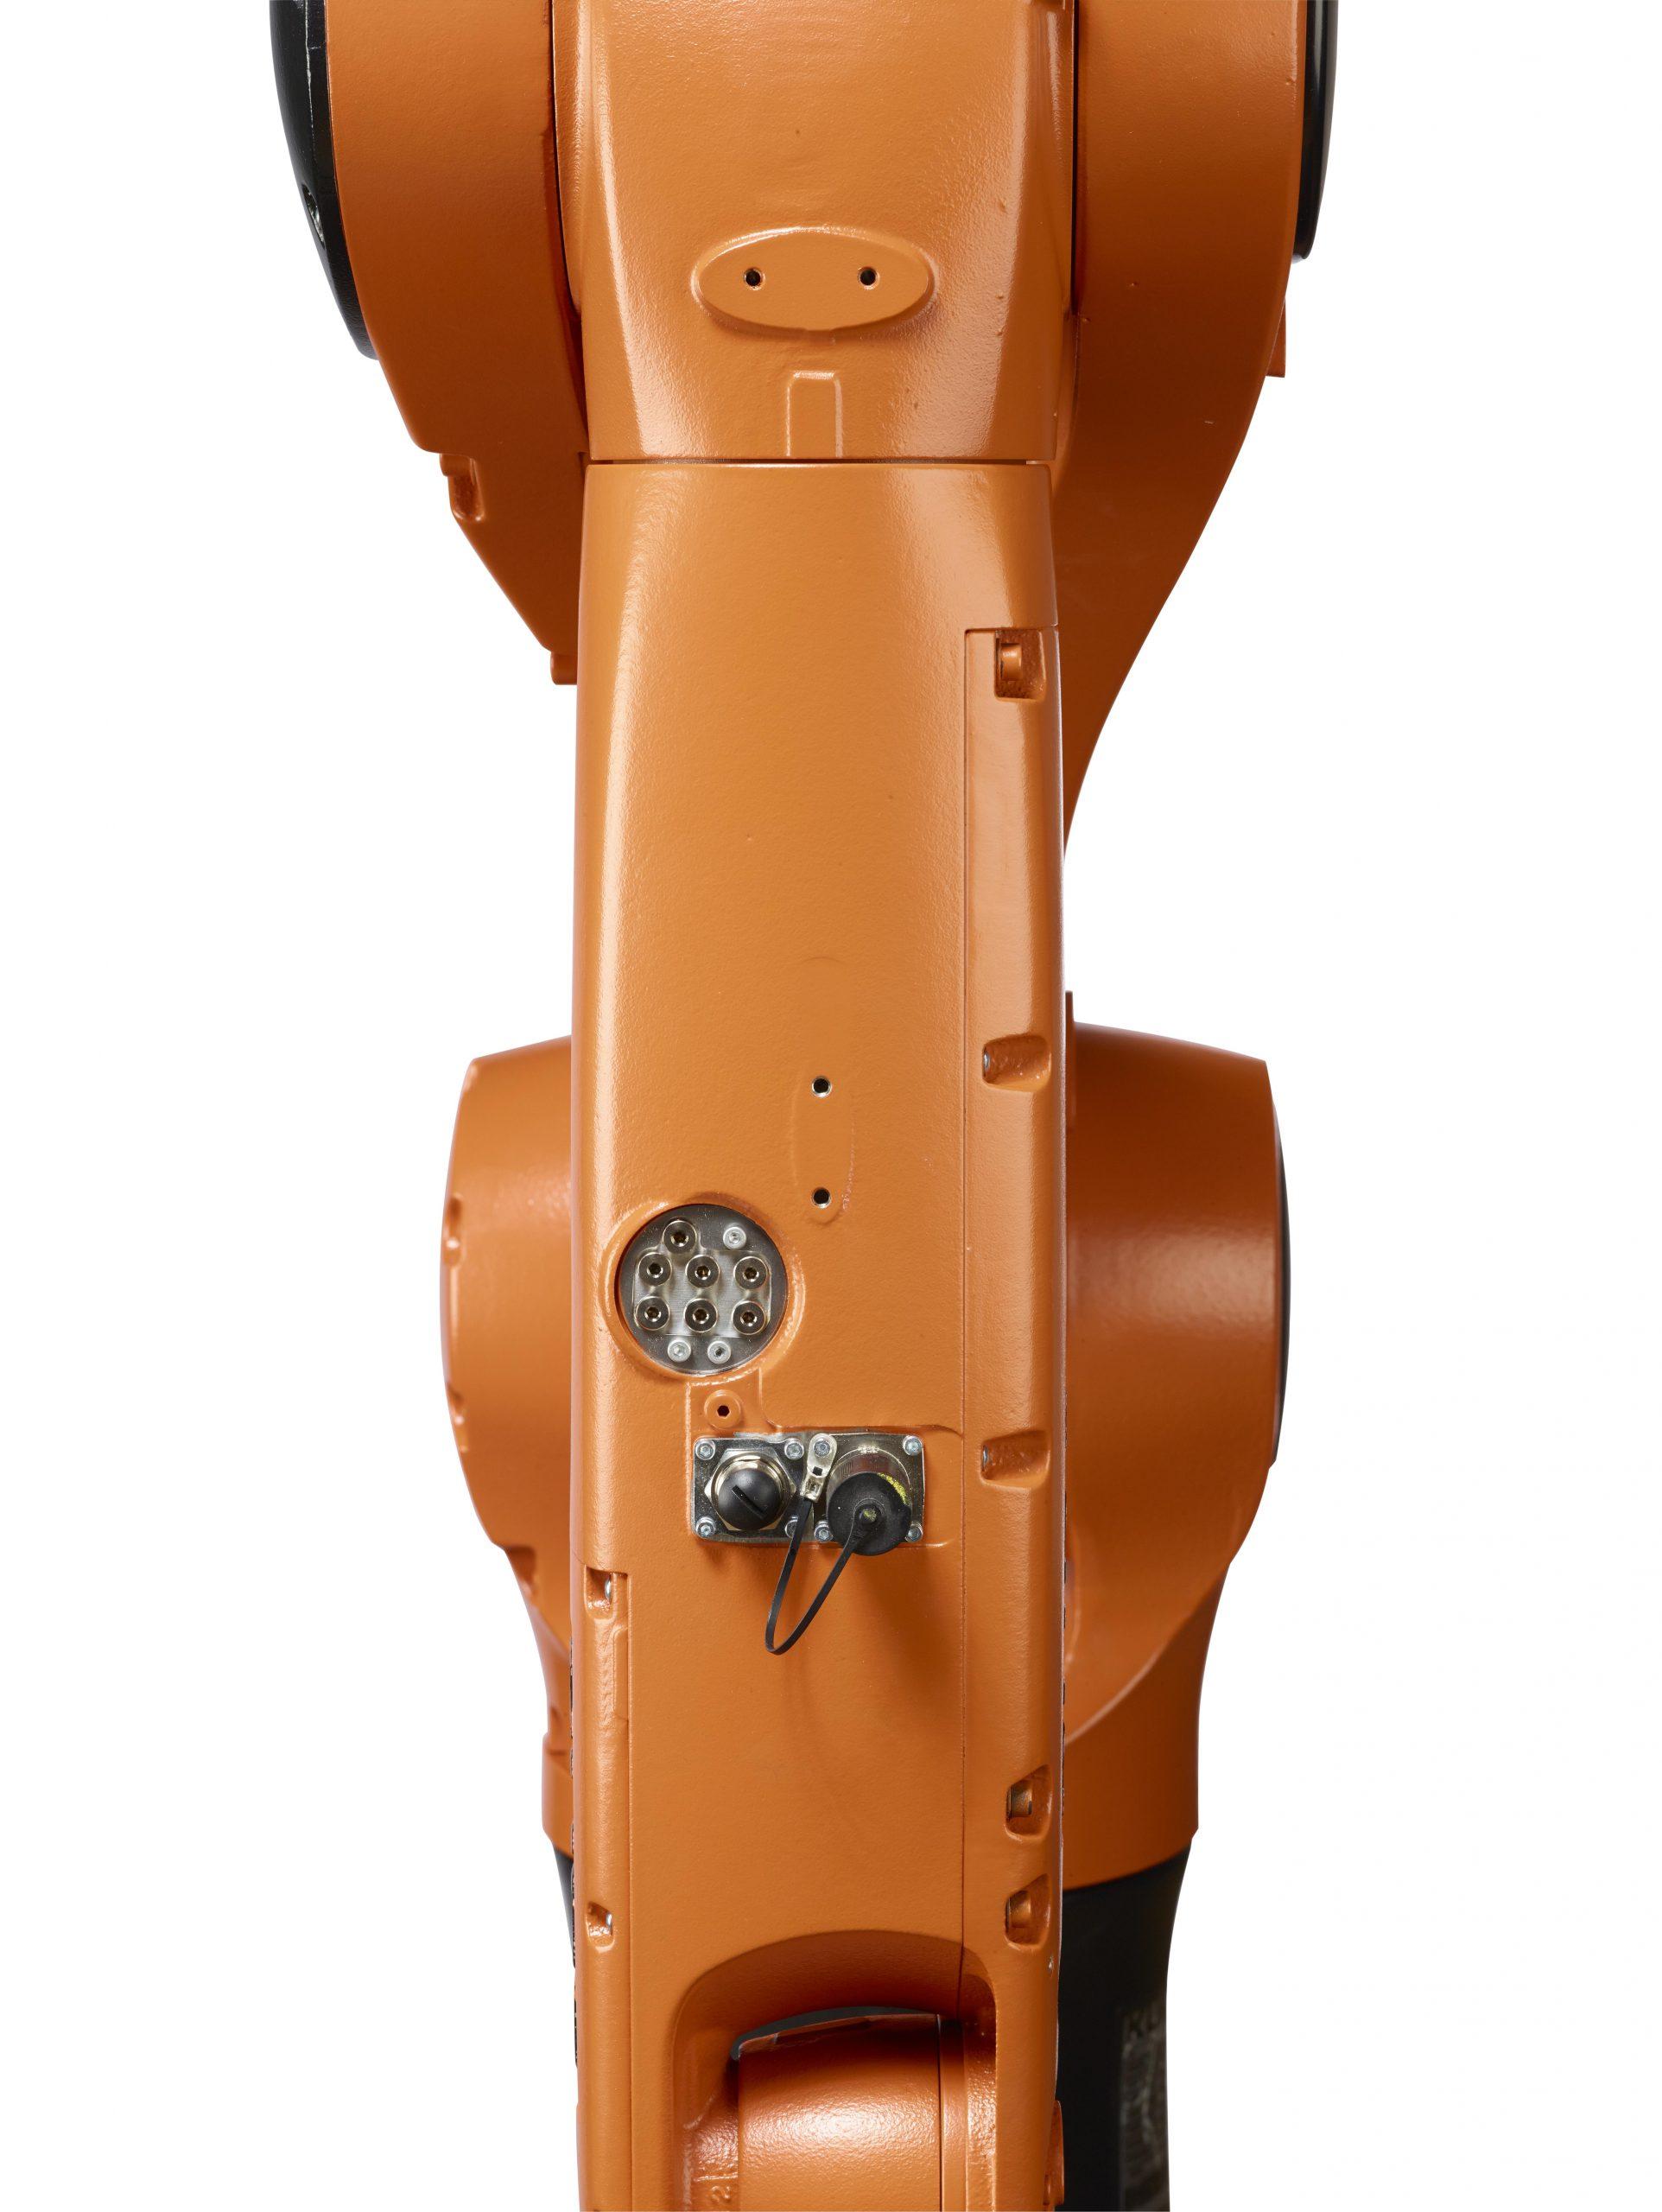 KUKA KR 10 R1100 sixx (KR AGILUS)-8